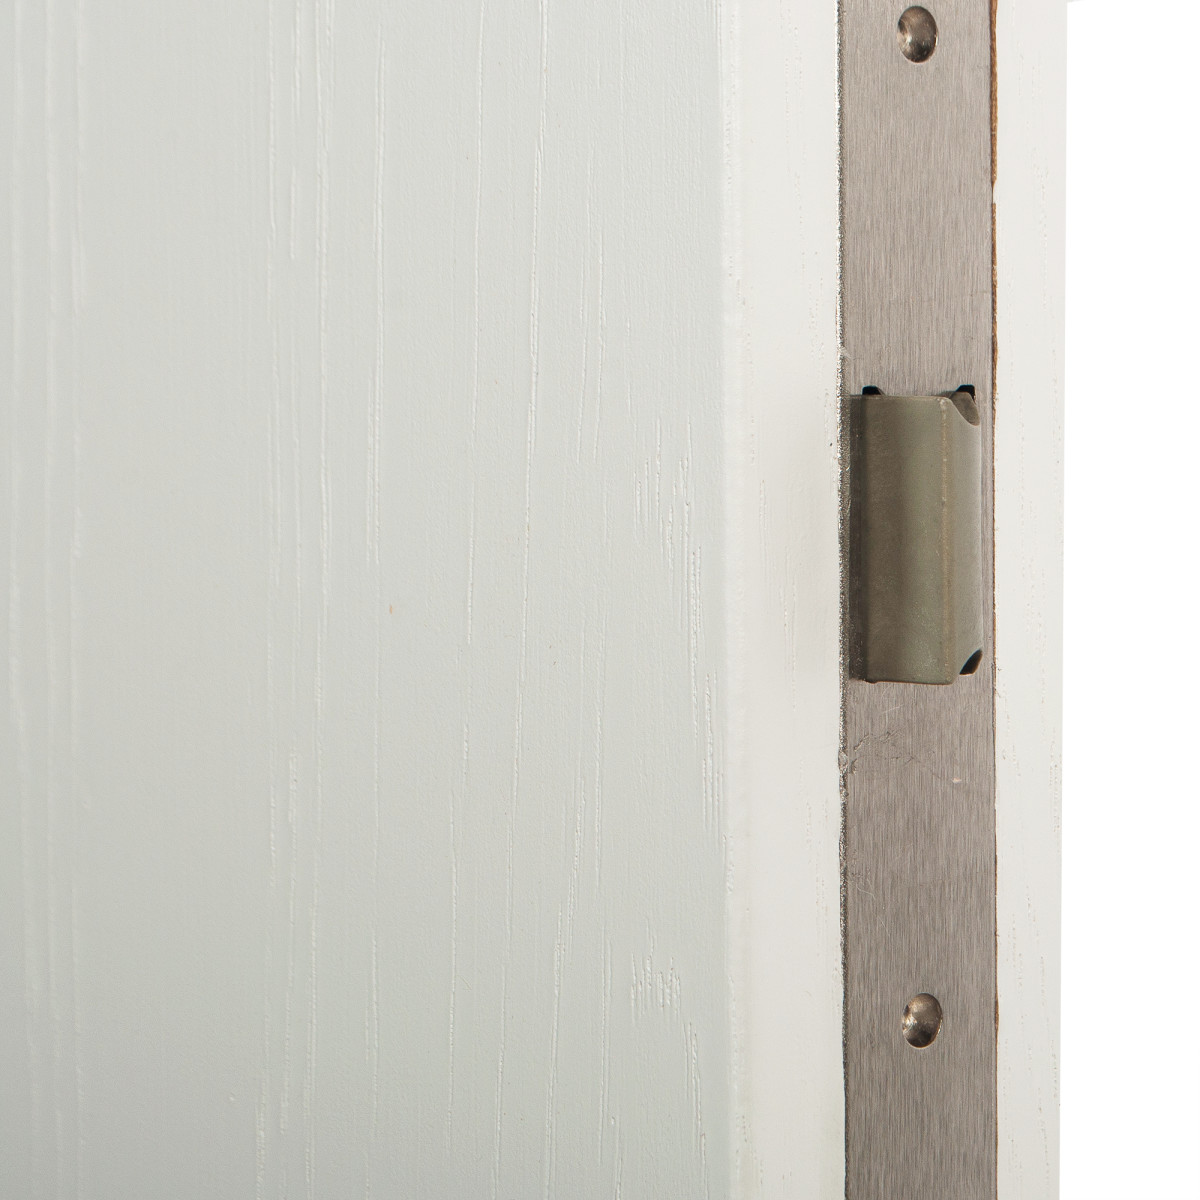 Дверь Межкомнатная Глухая Кристал 90x200 Цвет Пломбир